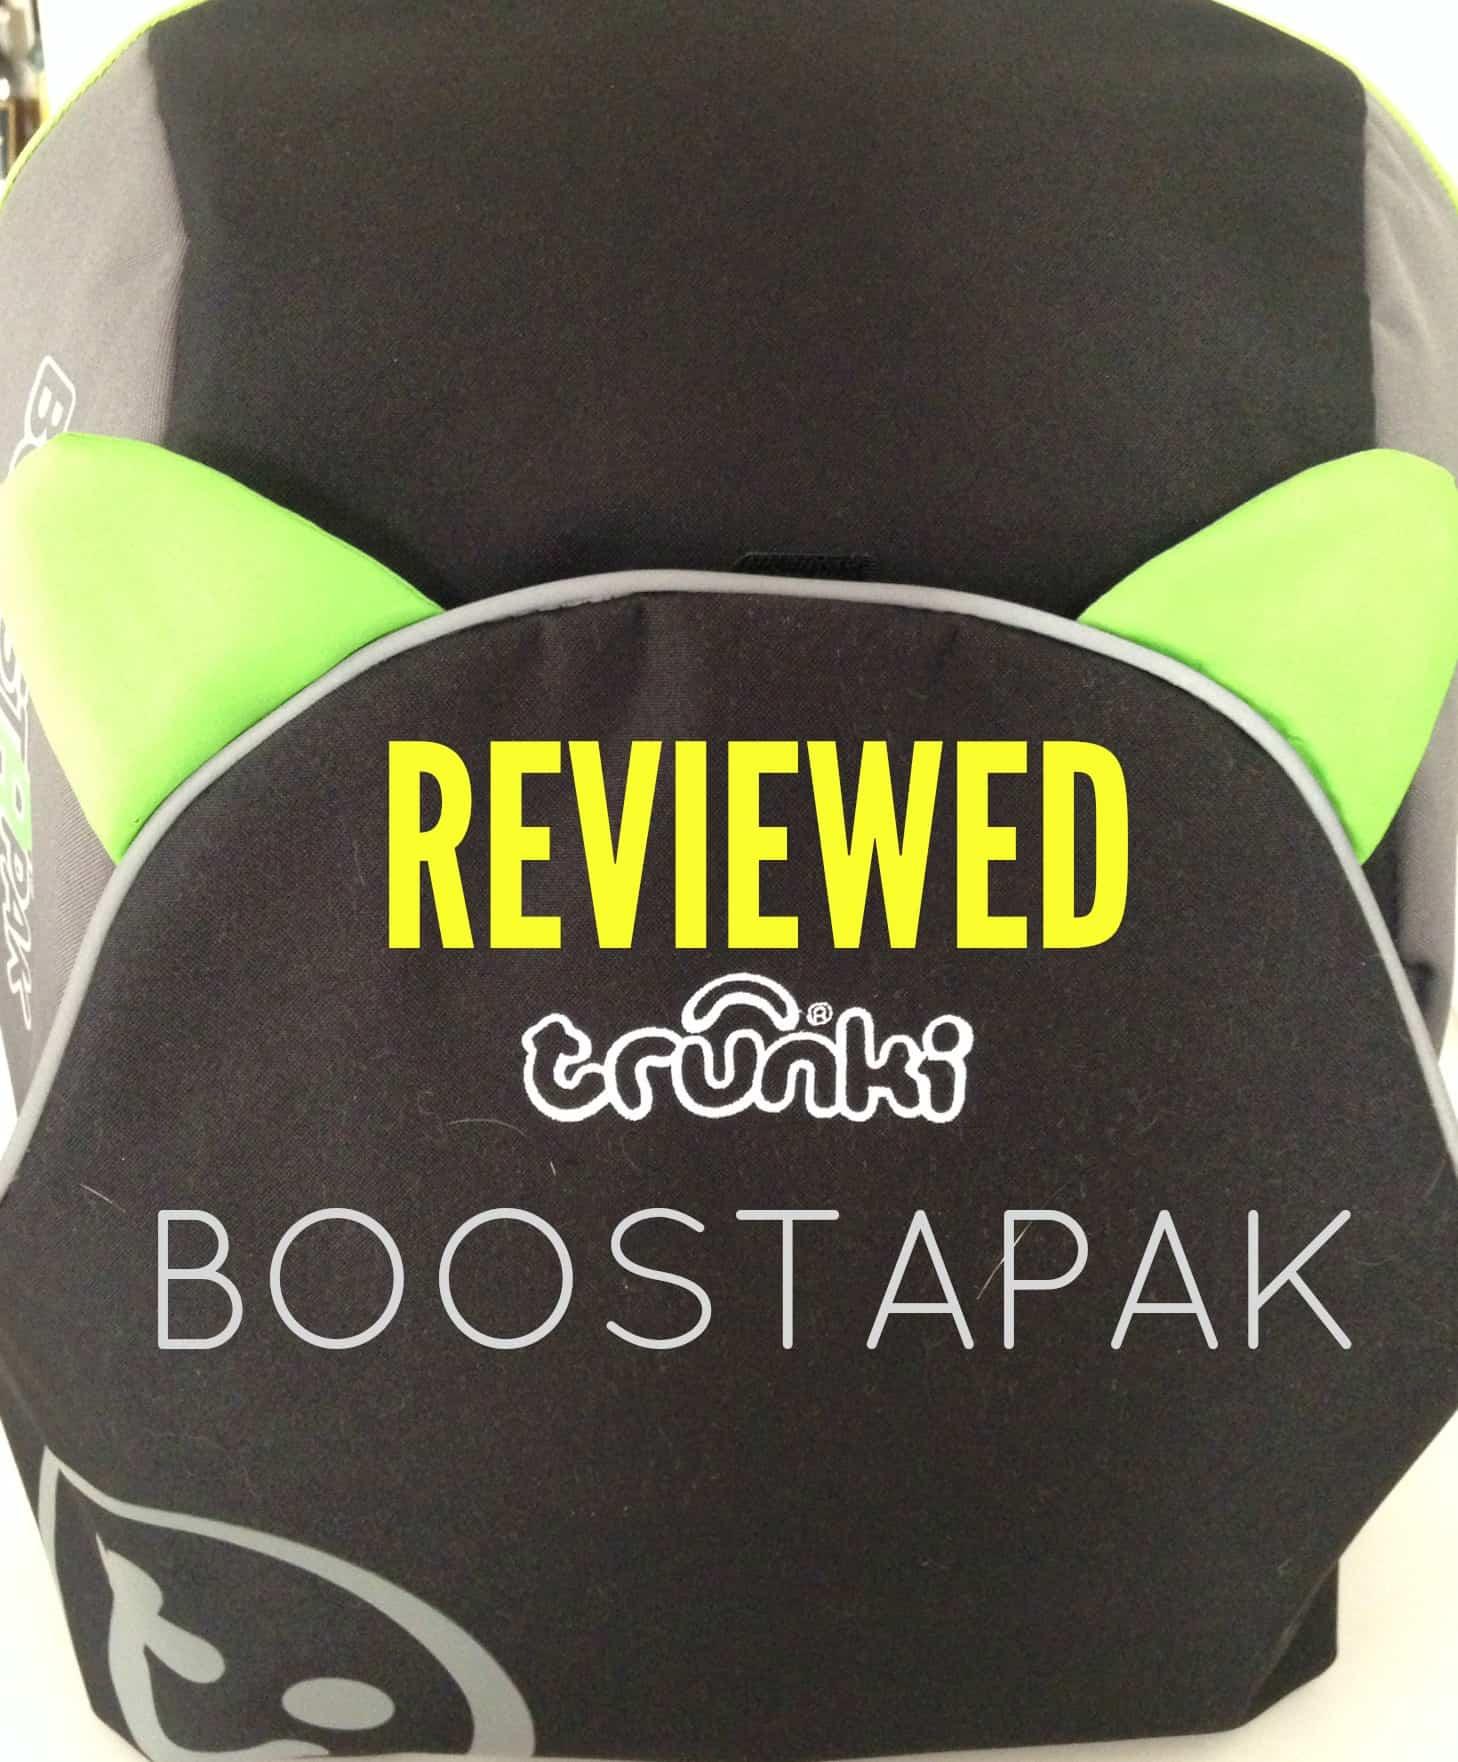 Reviewed: Trunki Boostapak